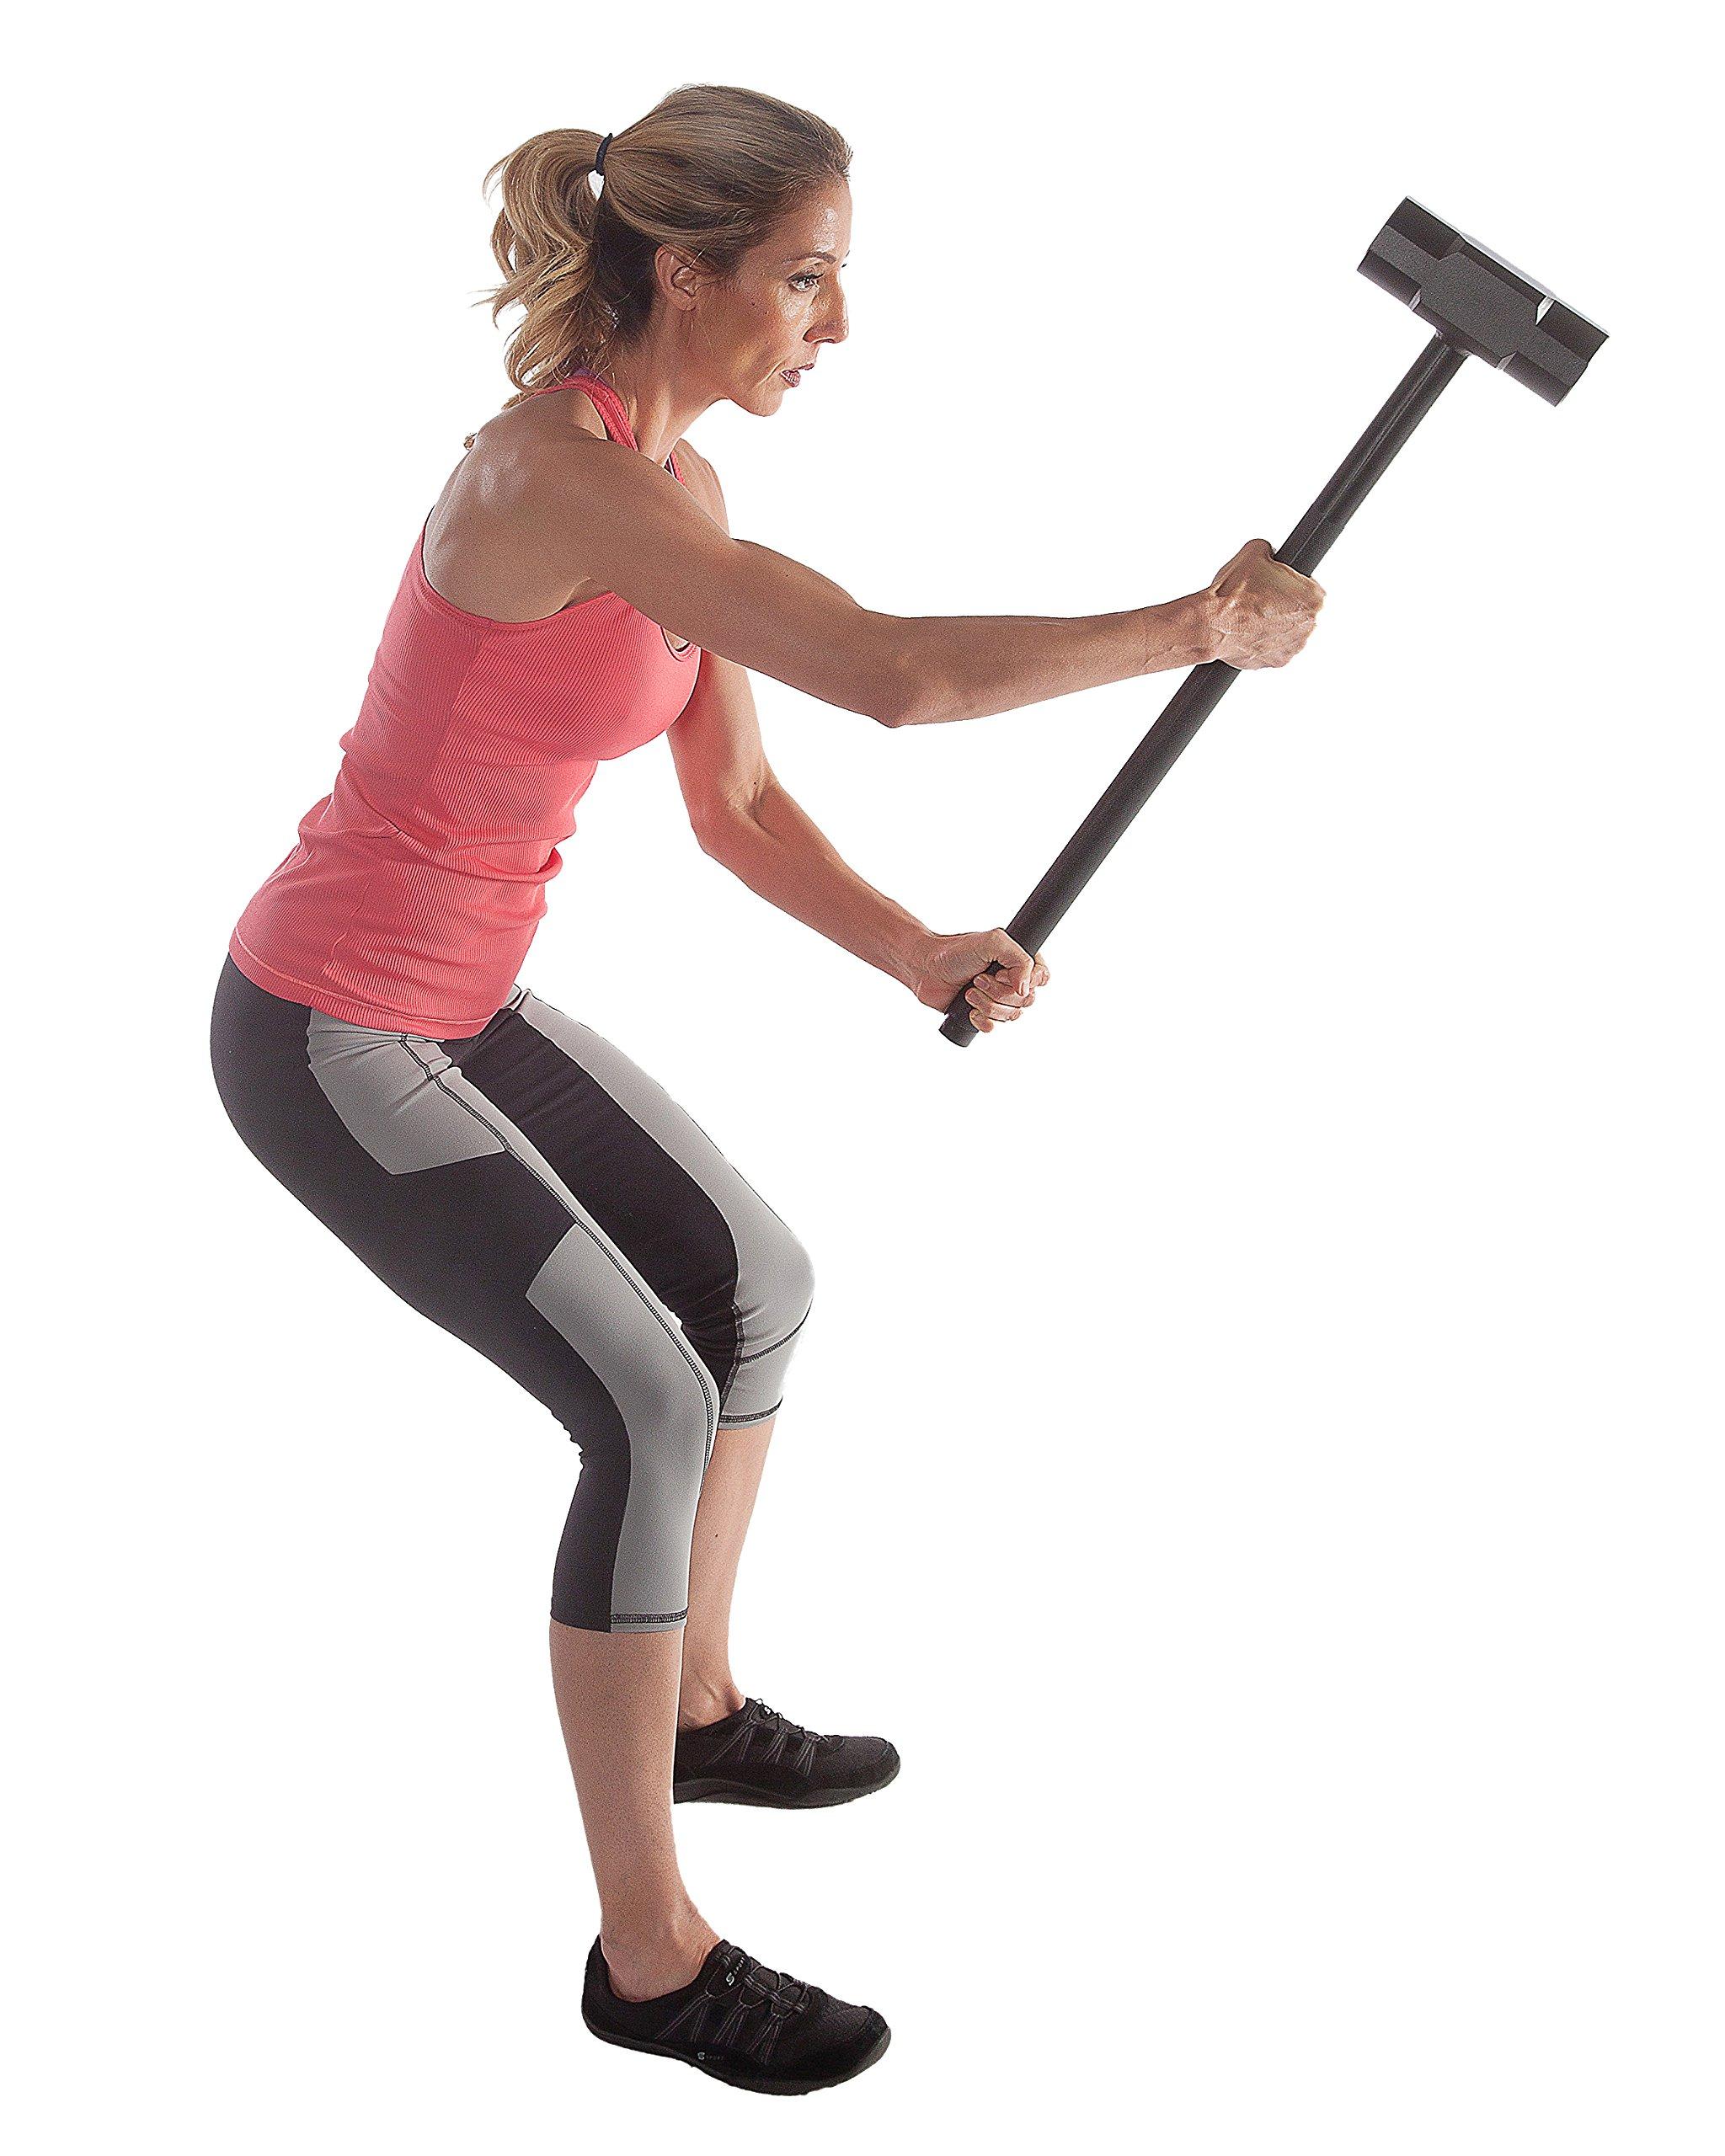 Apollo Athletics Steel Sledgehammer for Fitness, 25LB by Apollo Athletics (Image #6)